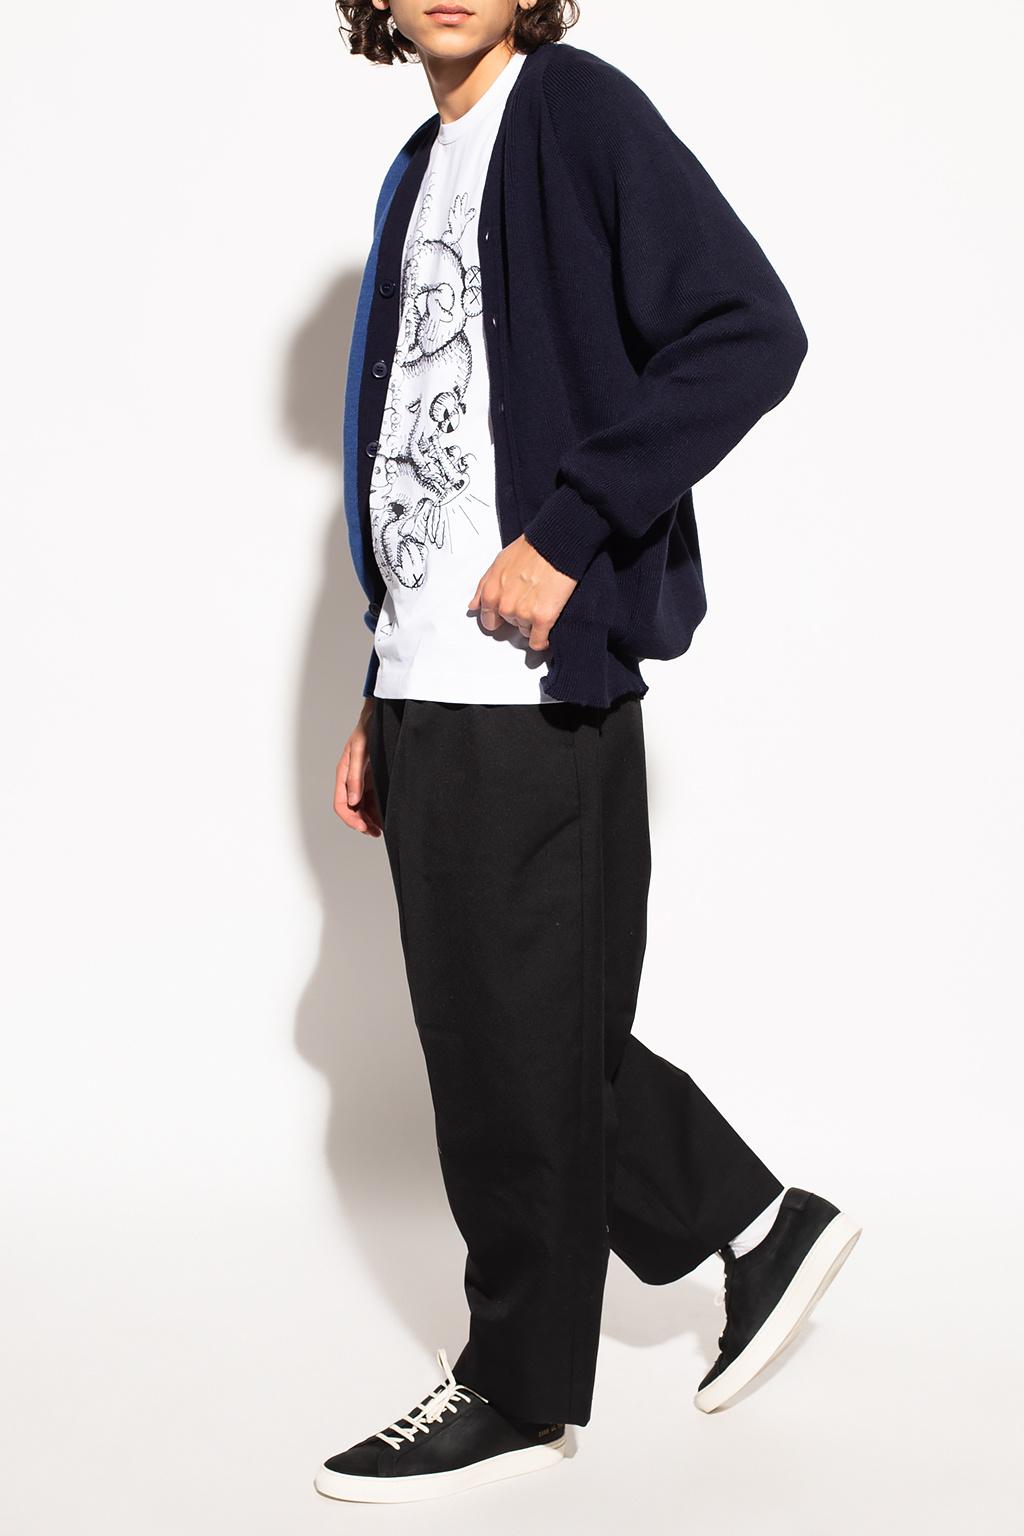 Comme des Garcons Shirt Buttoned-up cardigan